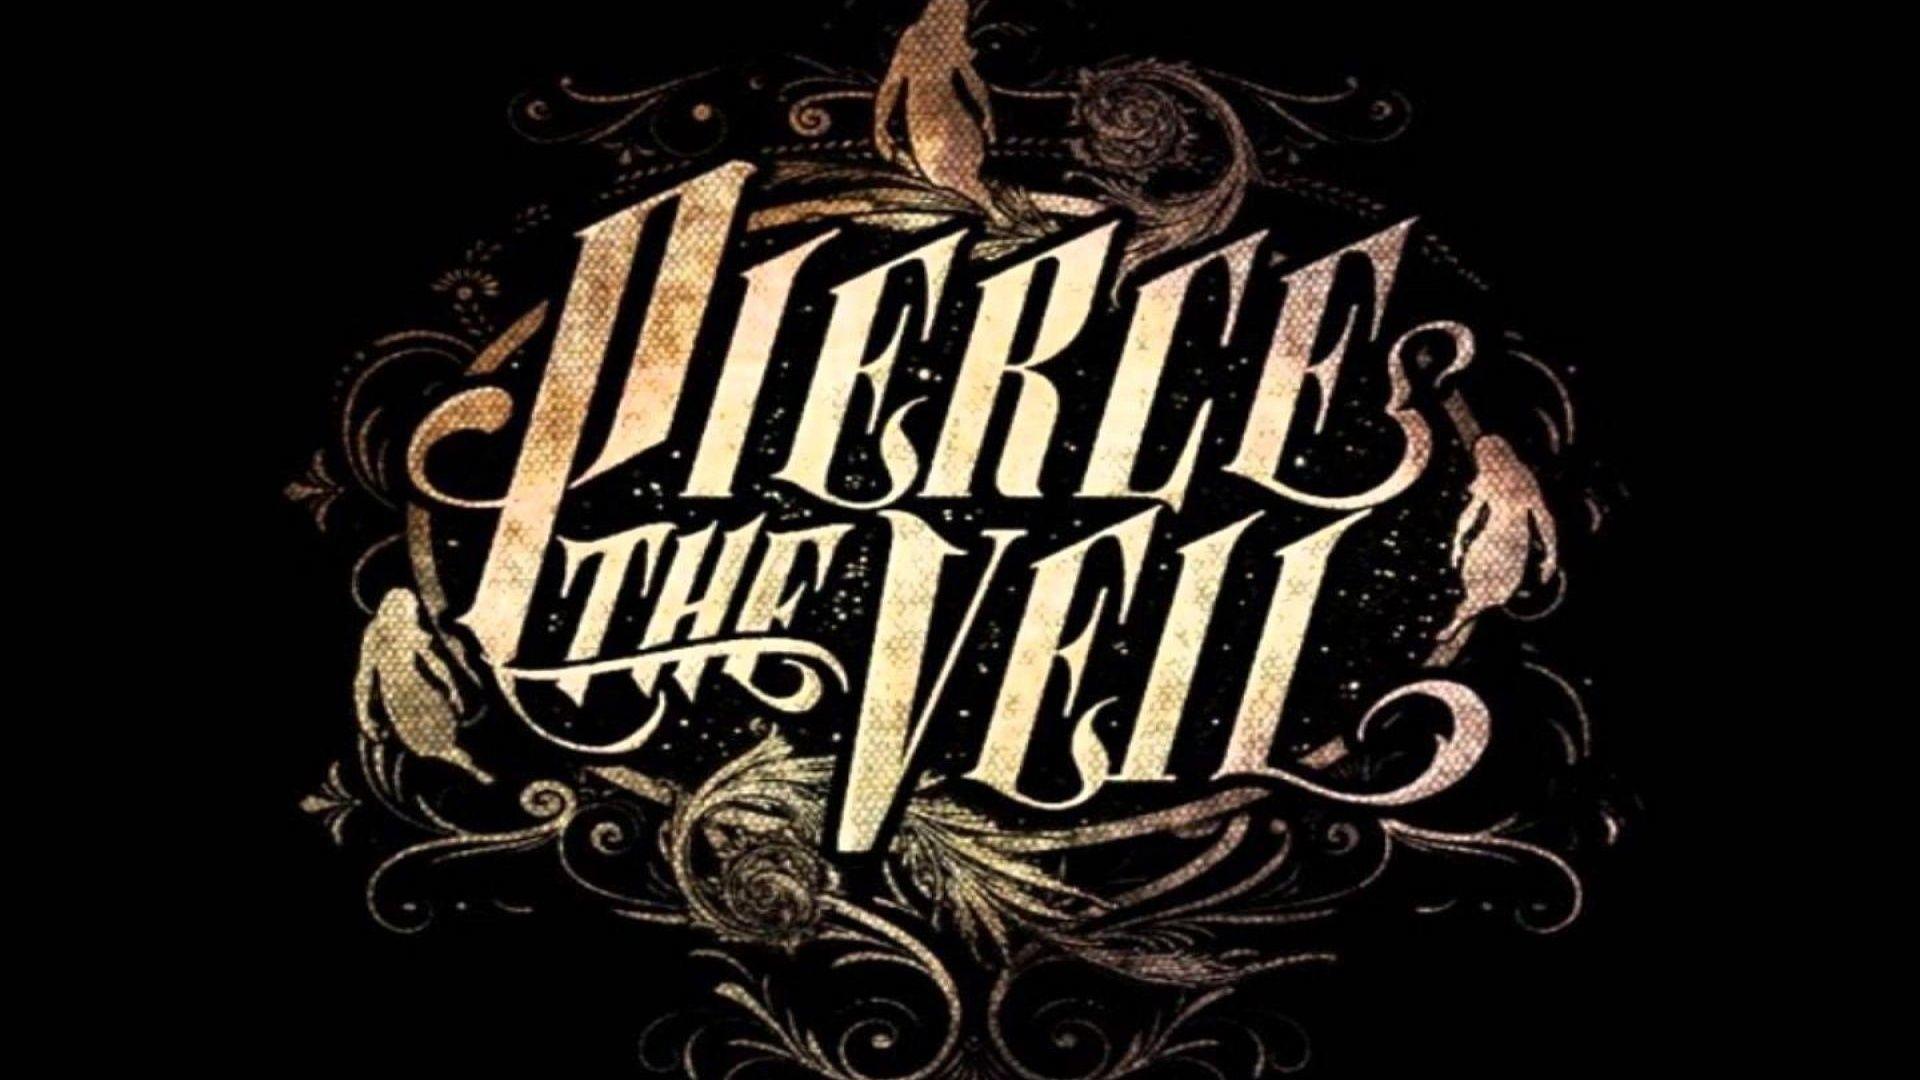 Logo Pierce The Veil - HD Wallpaper